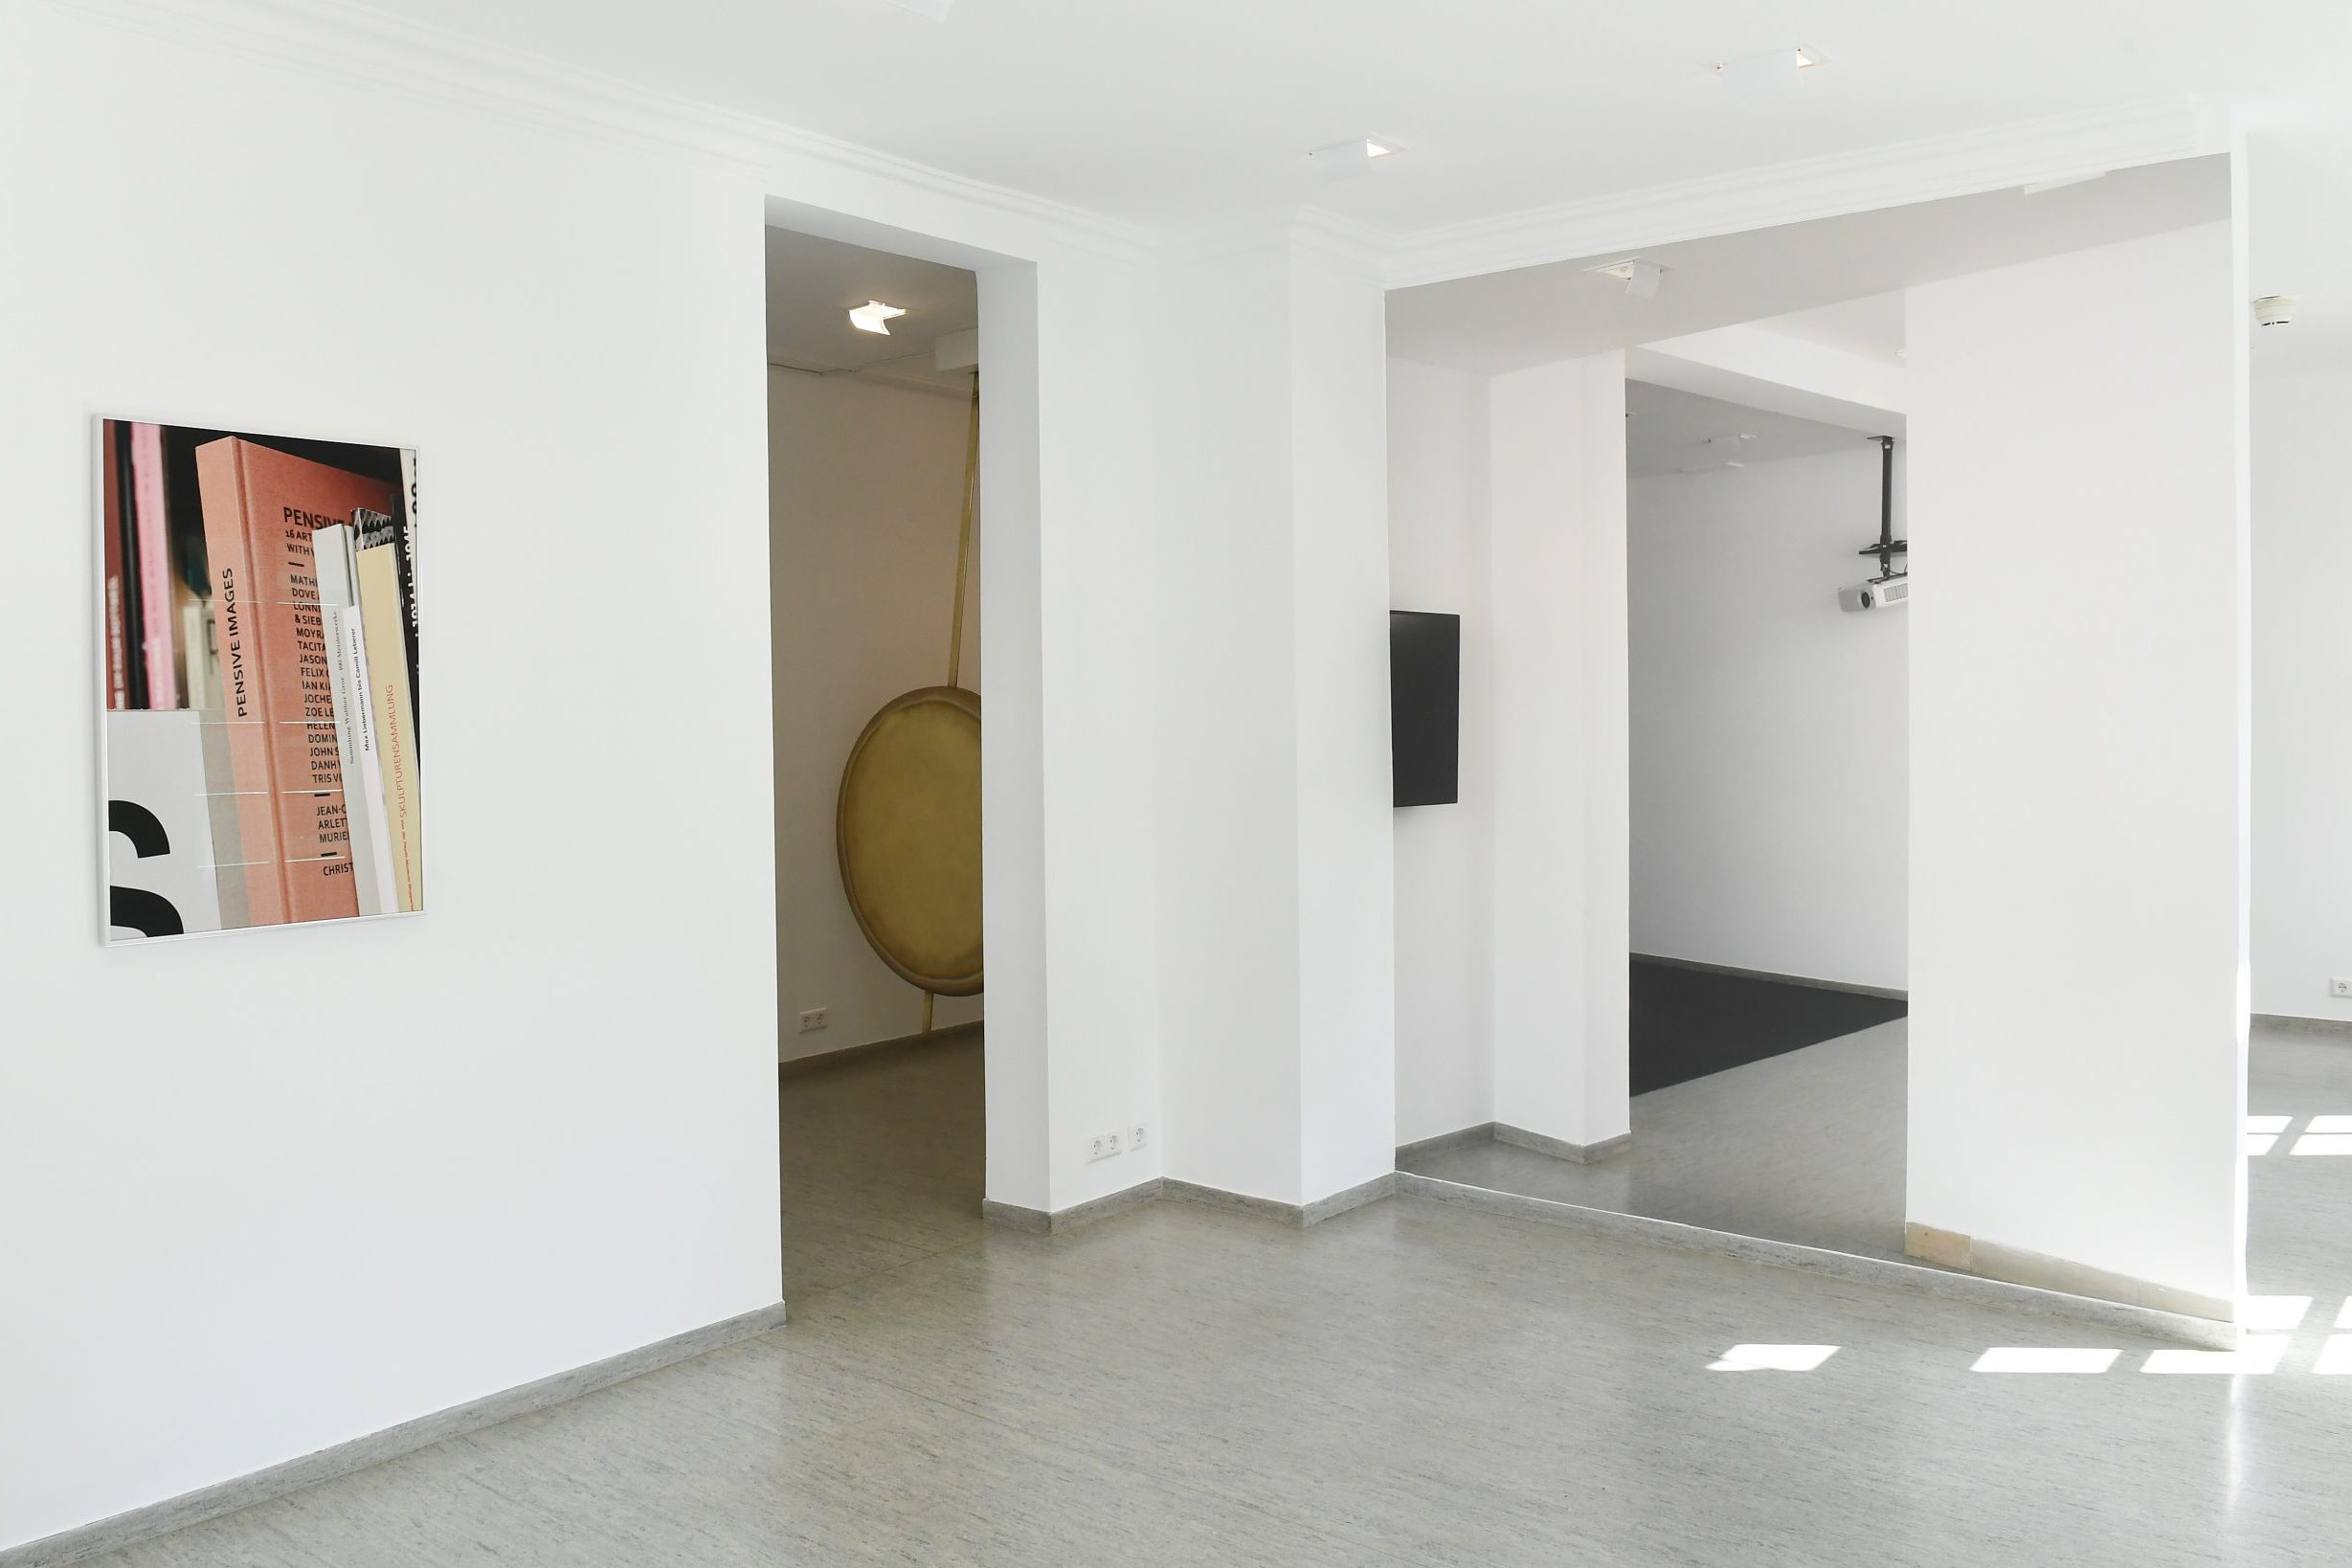 Javier Klaus Gastelum, Vertical Shift I, 2021